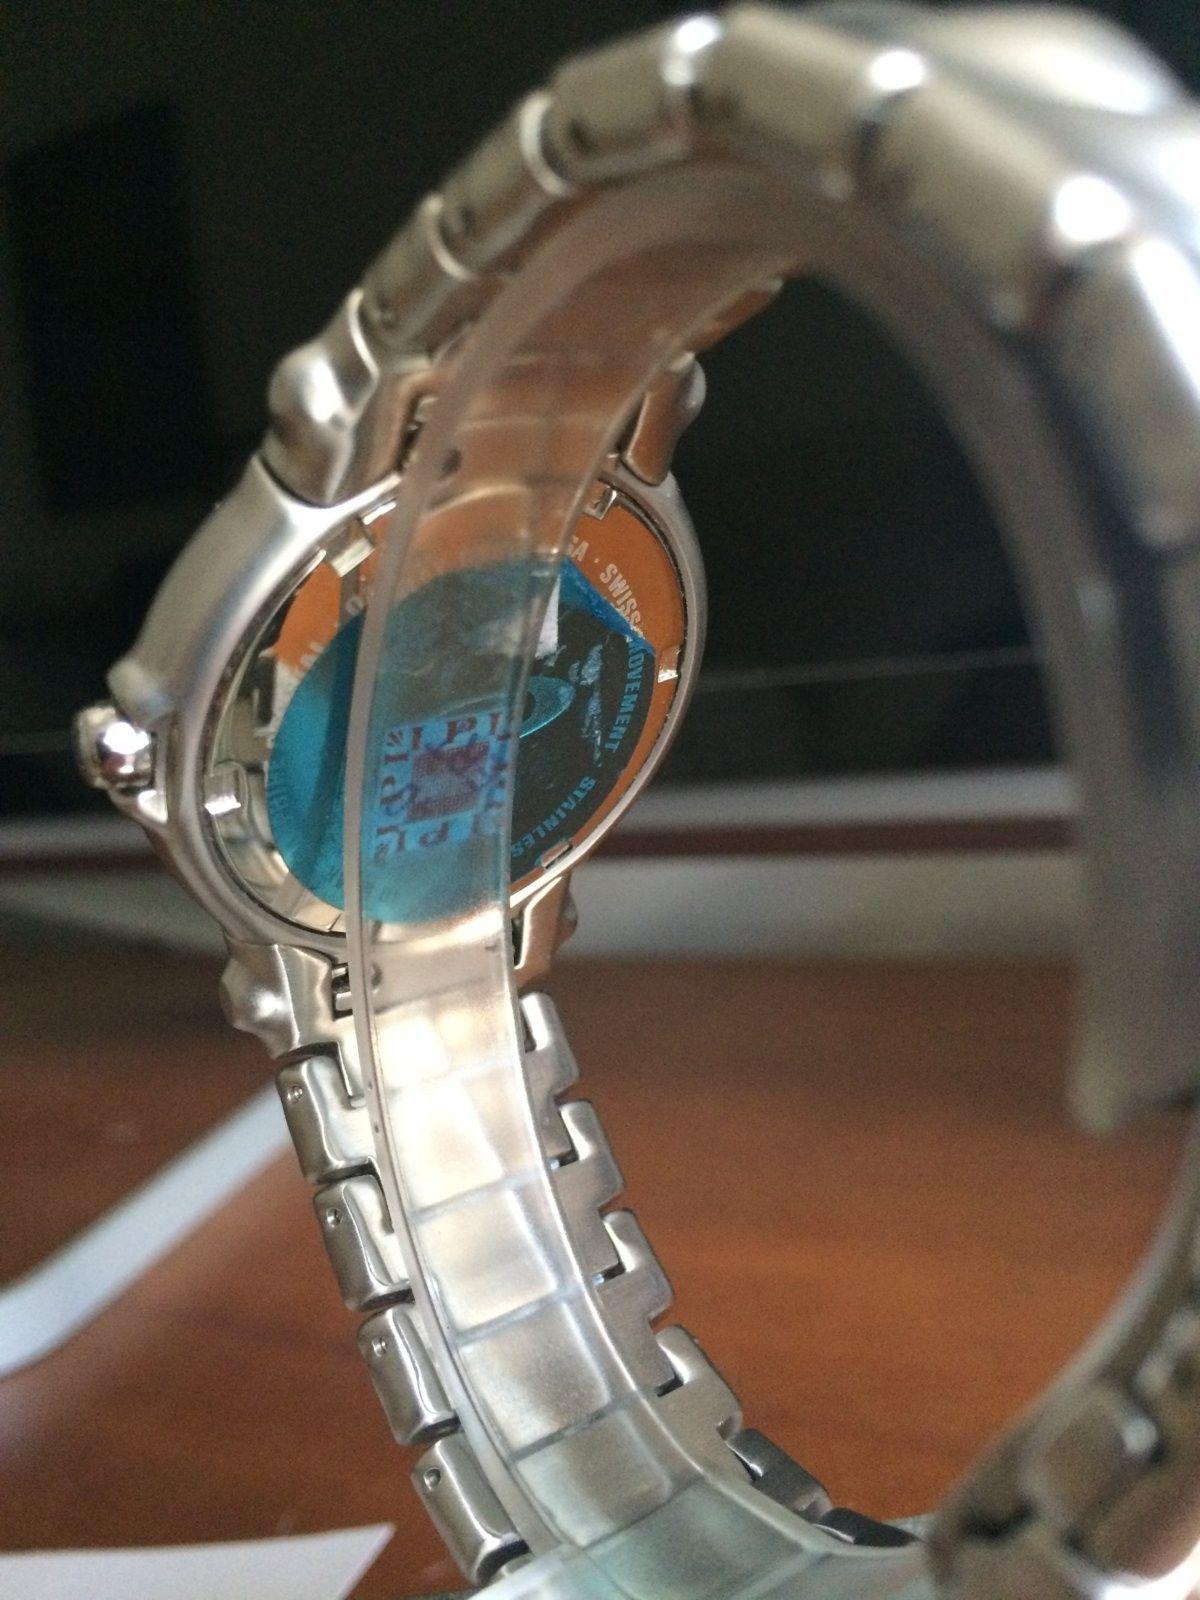 Oakley Jury Watch (BN) - Honed / Gunmetal (SKU 10-170) - IMG_2900.JPG